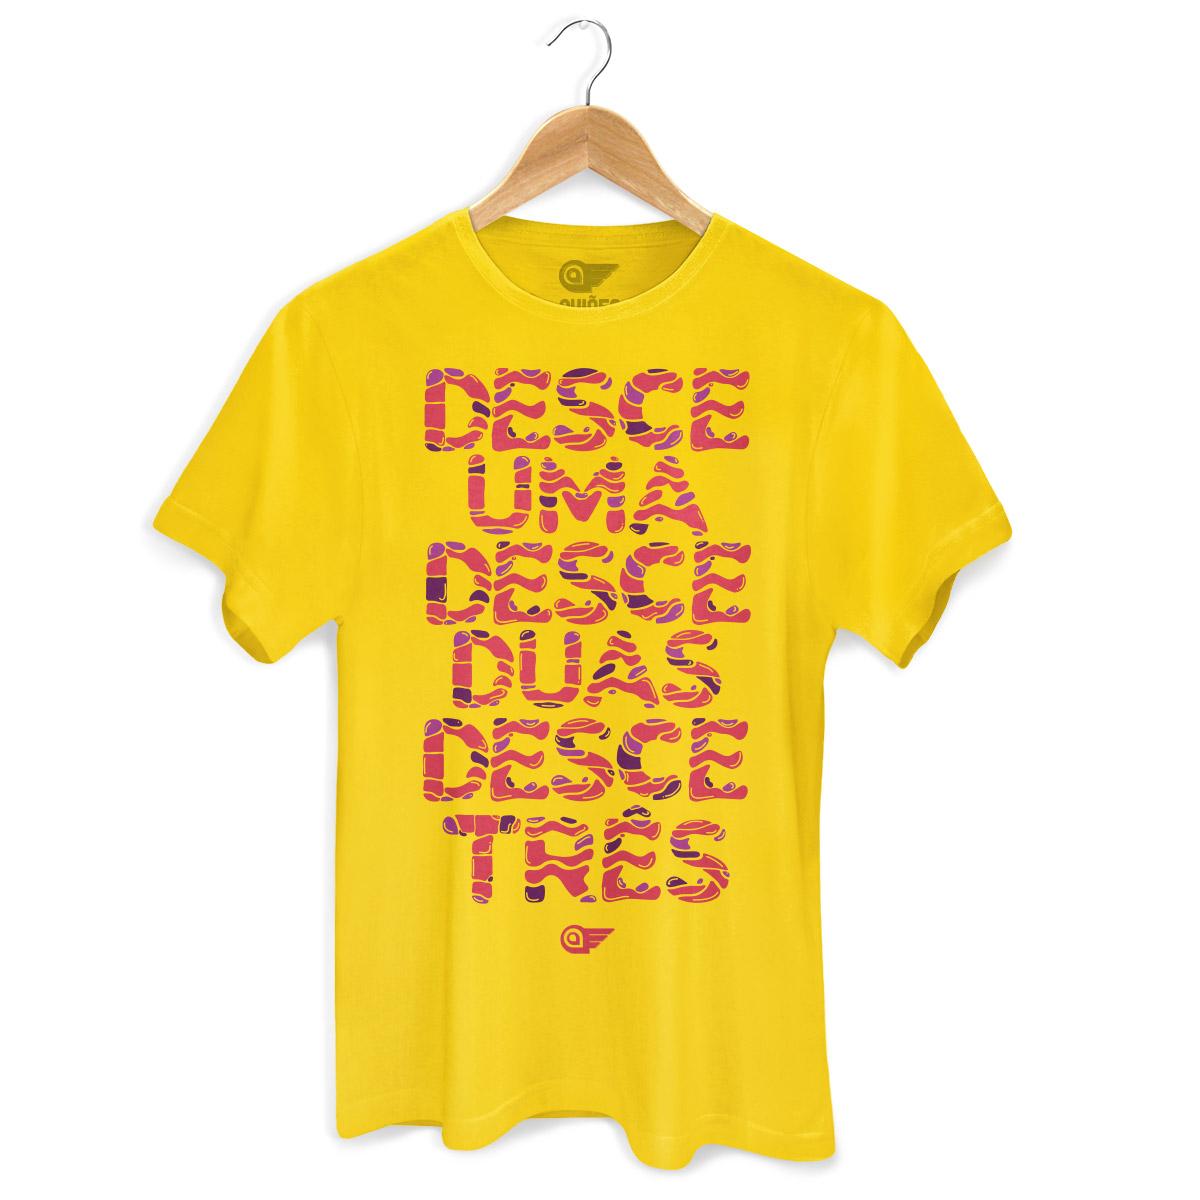 Camiseta Masculina Avi�es do Forr� Desce Duas